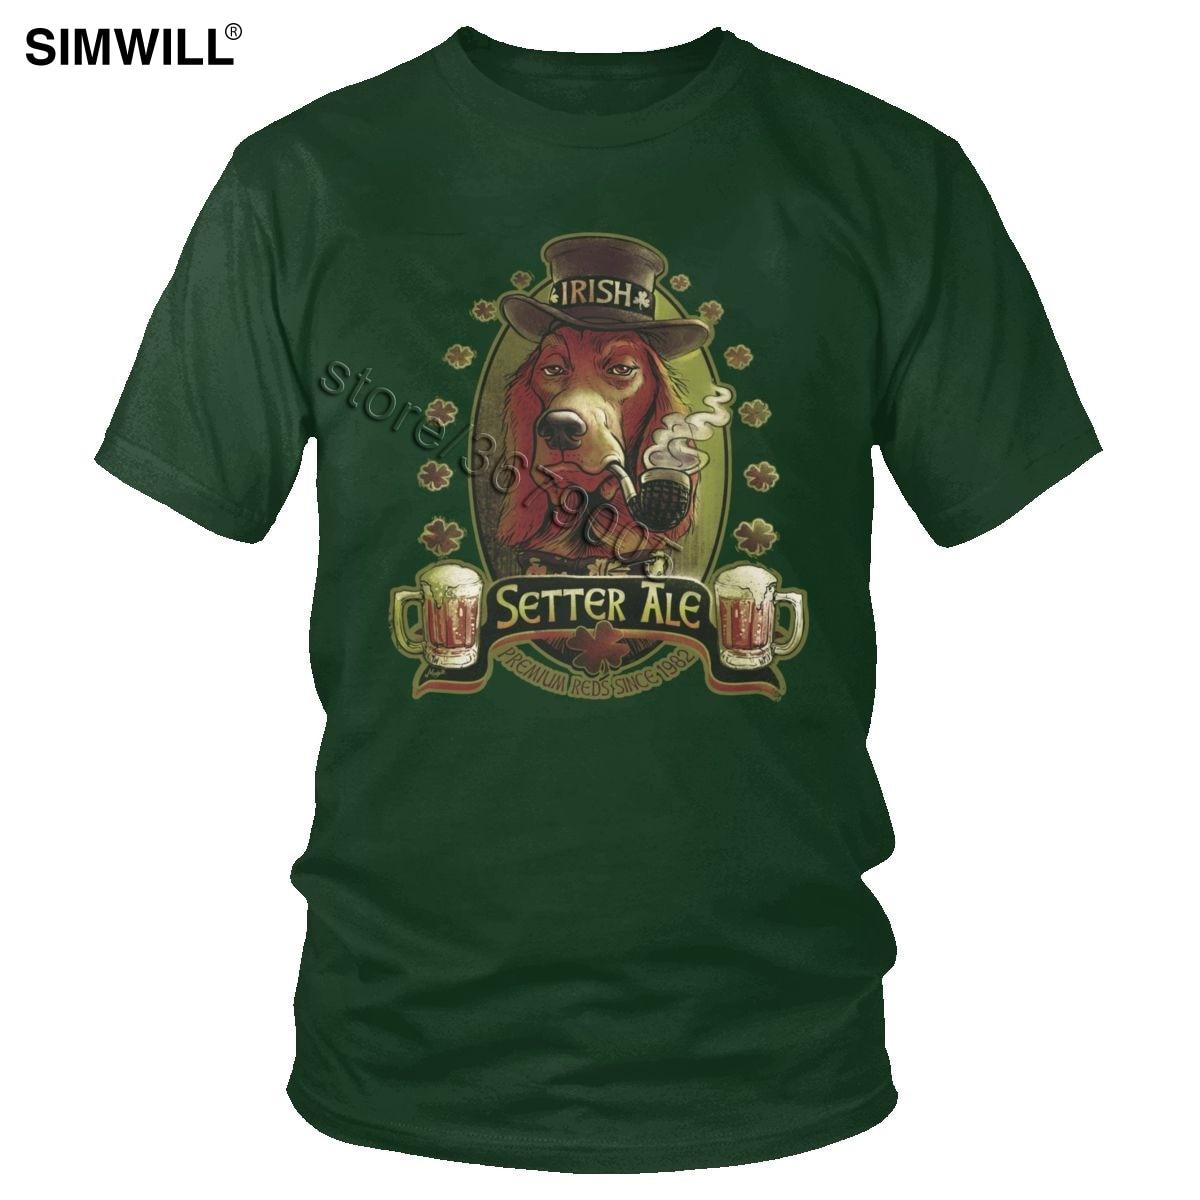 Nueva llegada de moda Camiseta de algodón para hombres, Camiseta de algodón para amantes de la cerveza, cerveza roja, para amantes de la cerveza, camiseta de manga corta